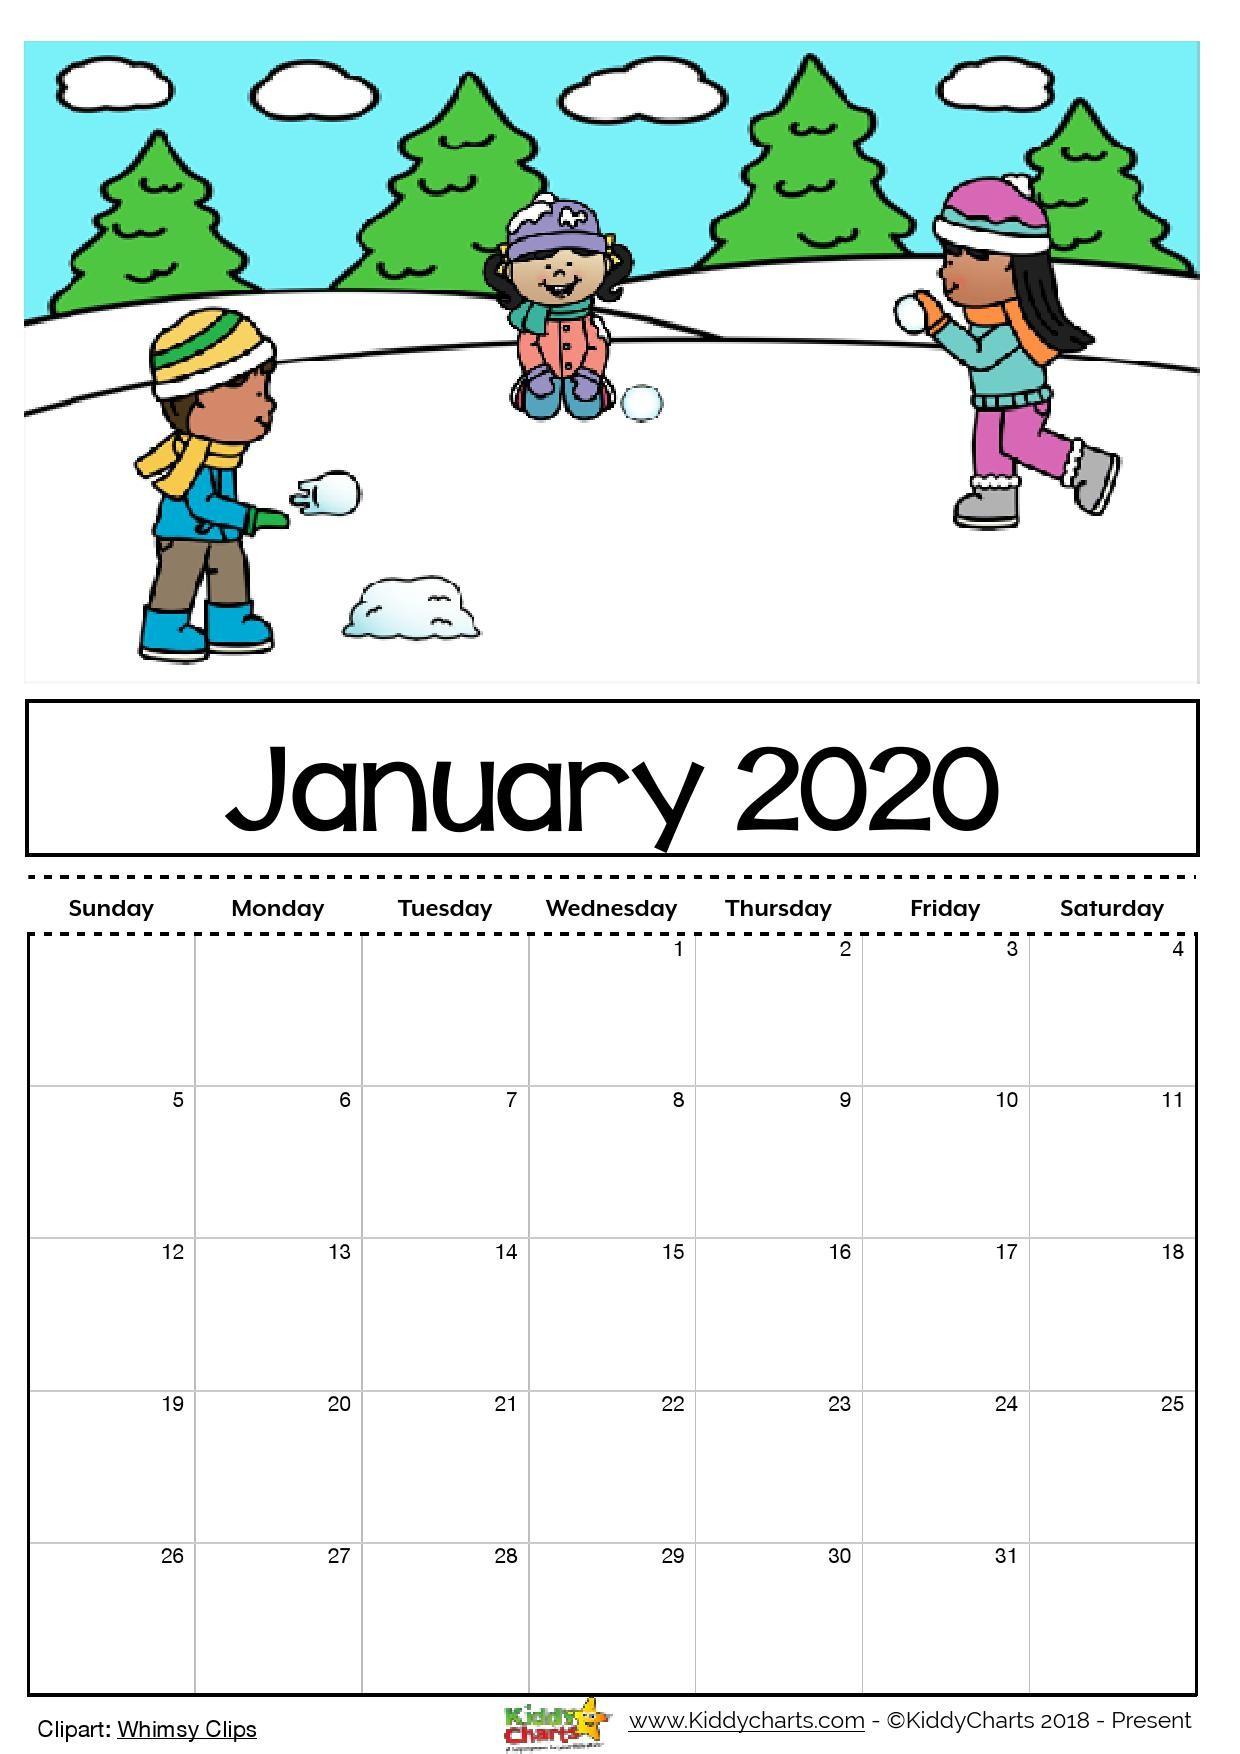 Free Printable January 2020 Calendar Free Printable 2020 Calendar for Kids Including An